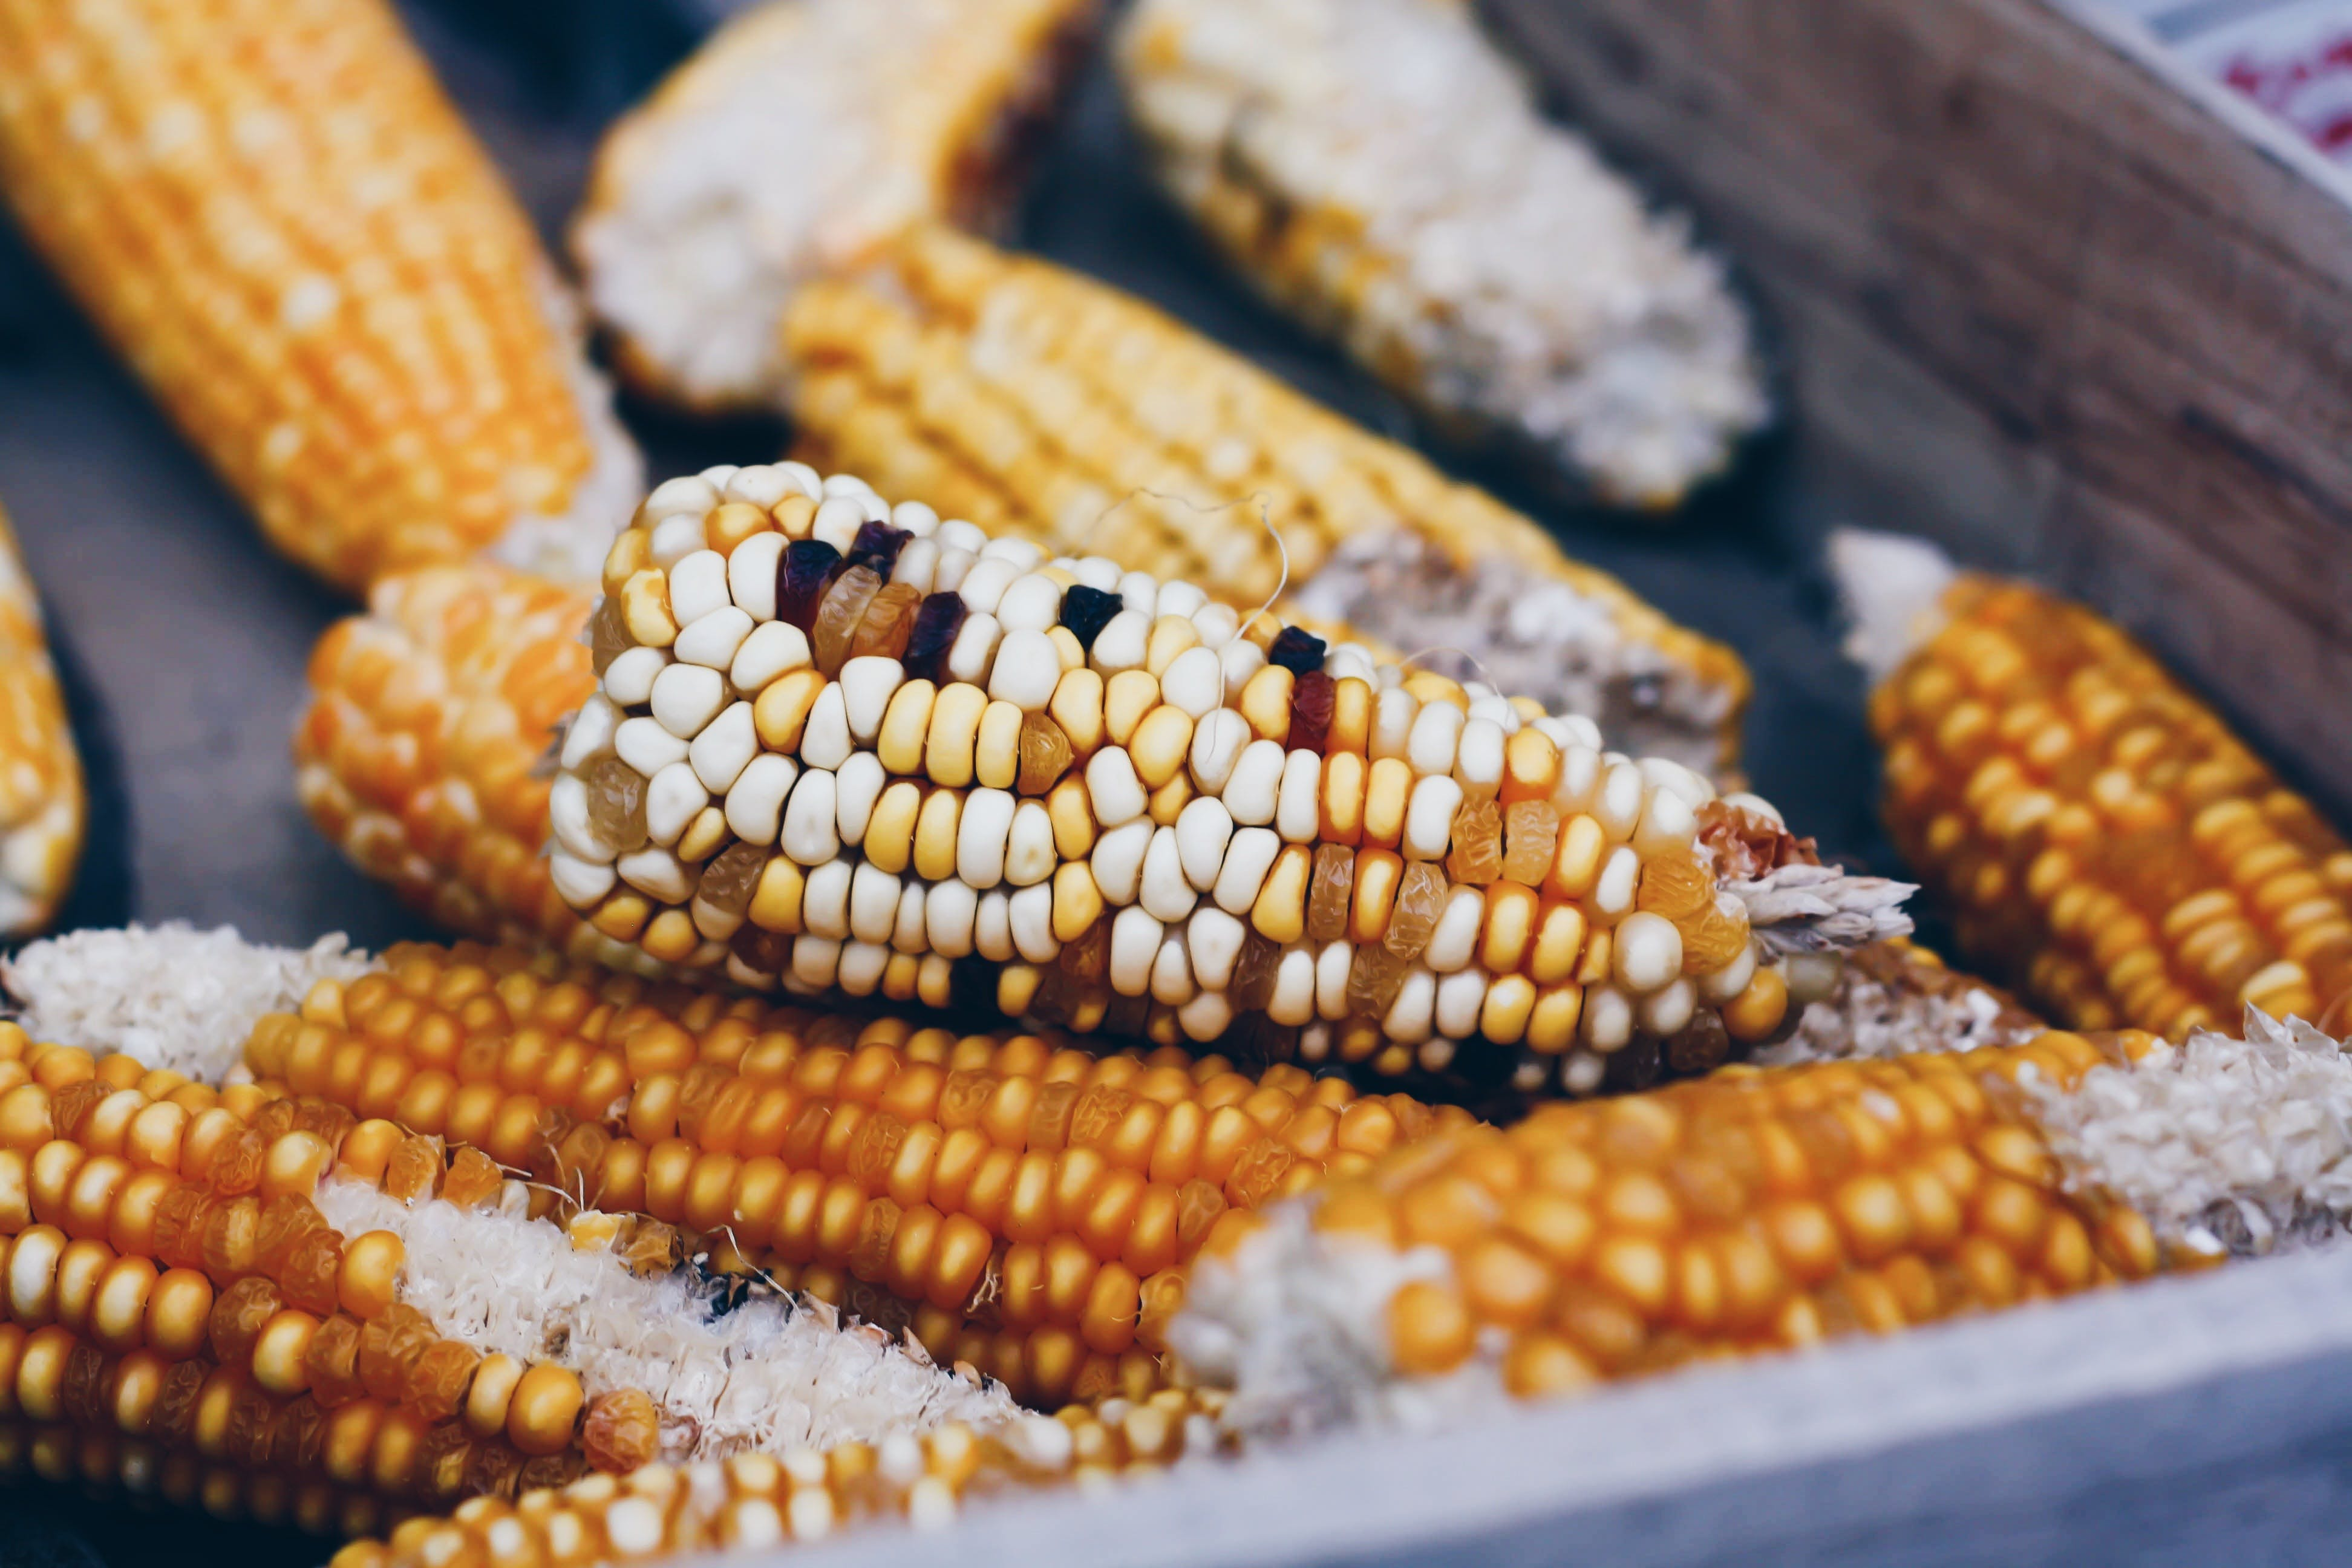 Free stock photo of food, healthy, corn, market